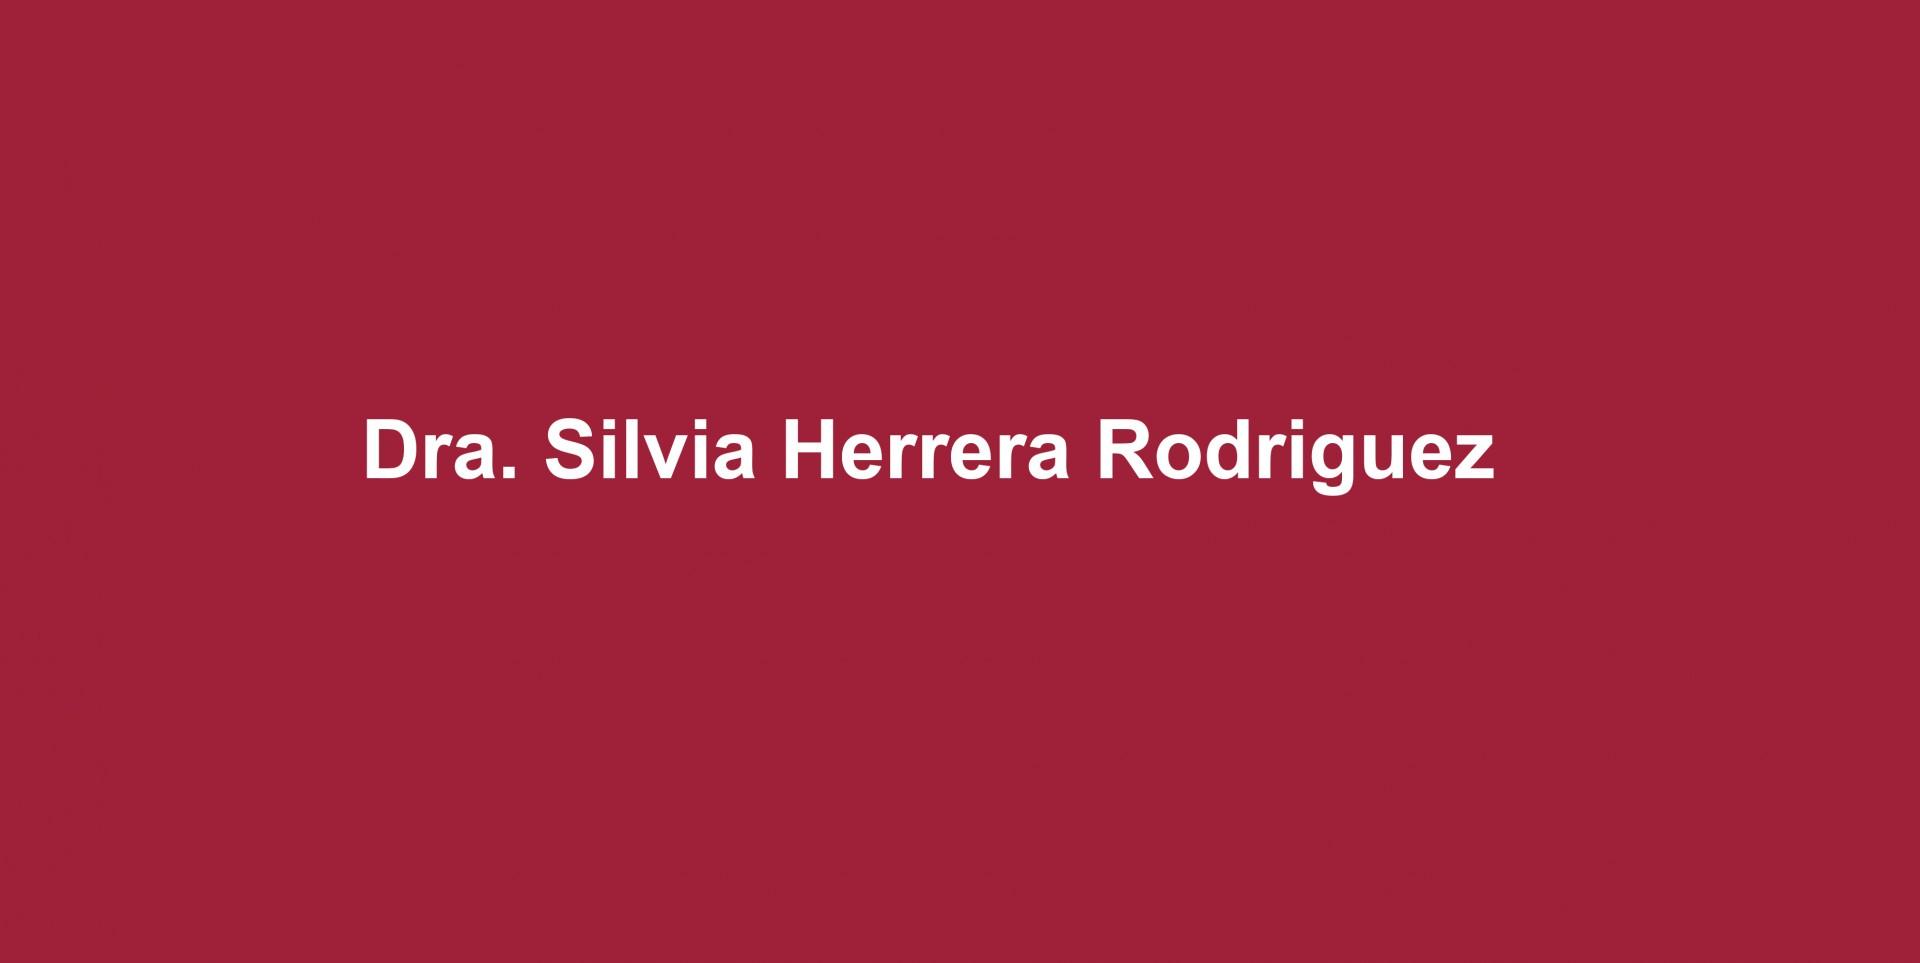 Dra. Silvia Herrera Rodríguez